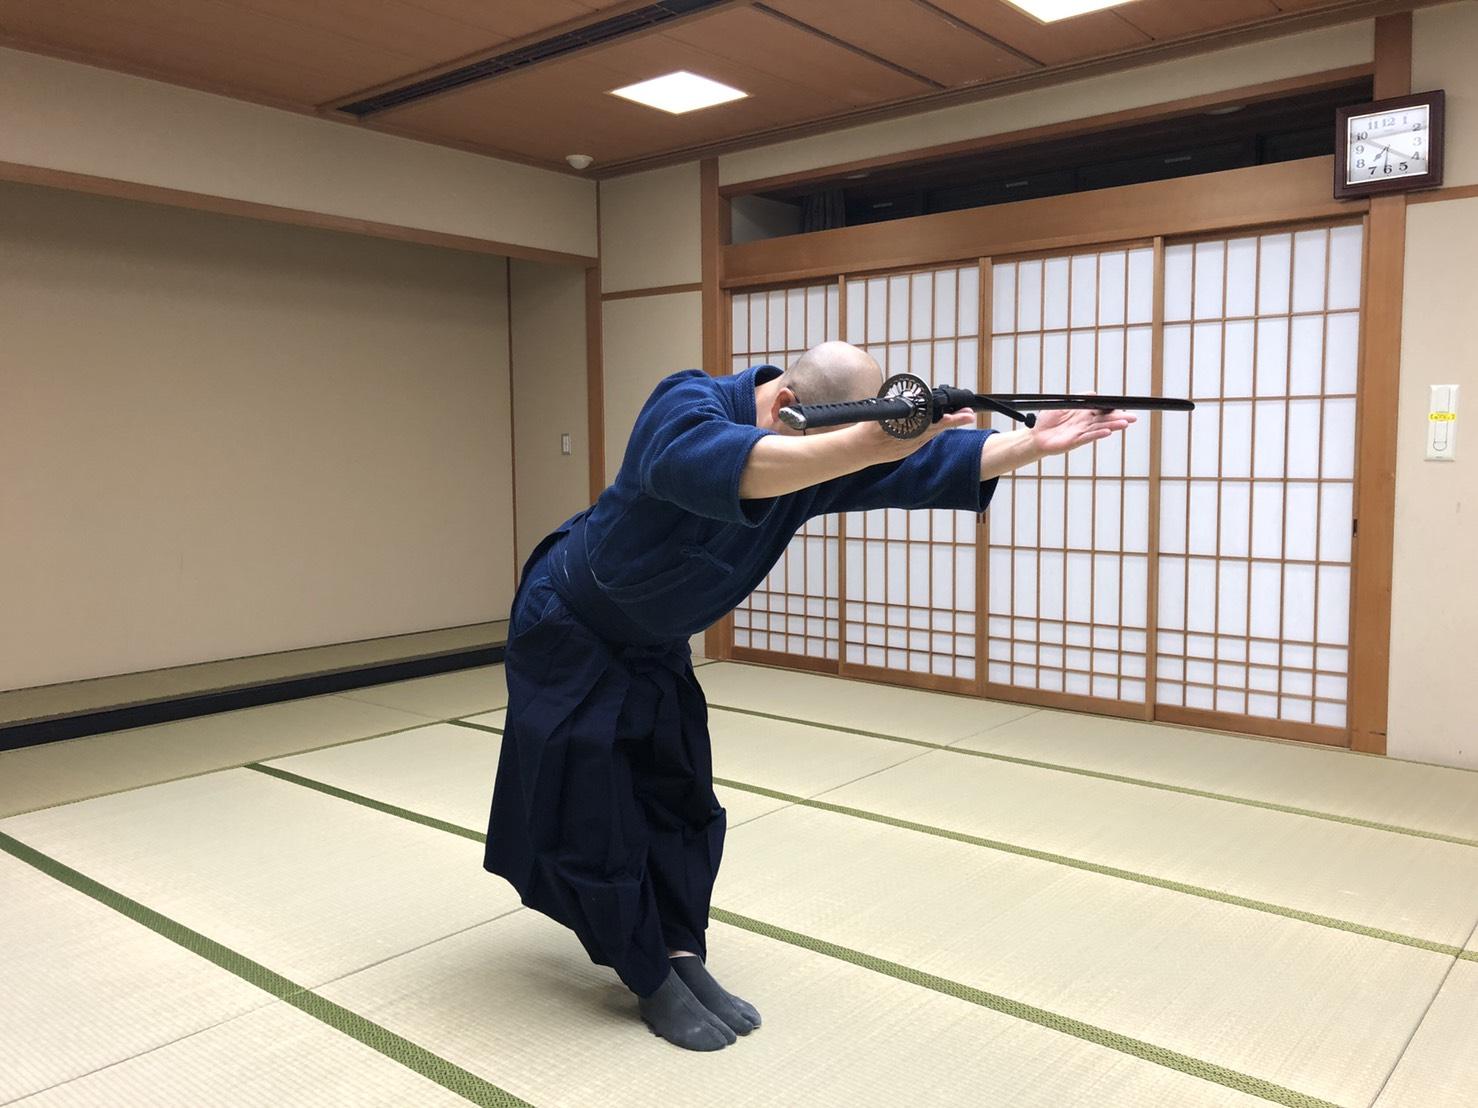 S  84181016 - 釈正輪老師、武道礼法&呼吸法開催